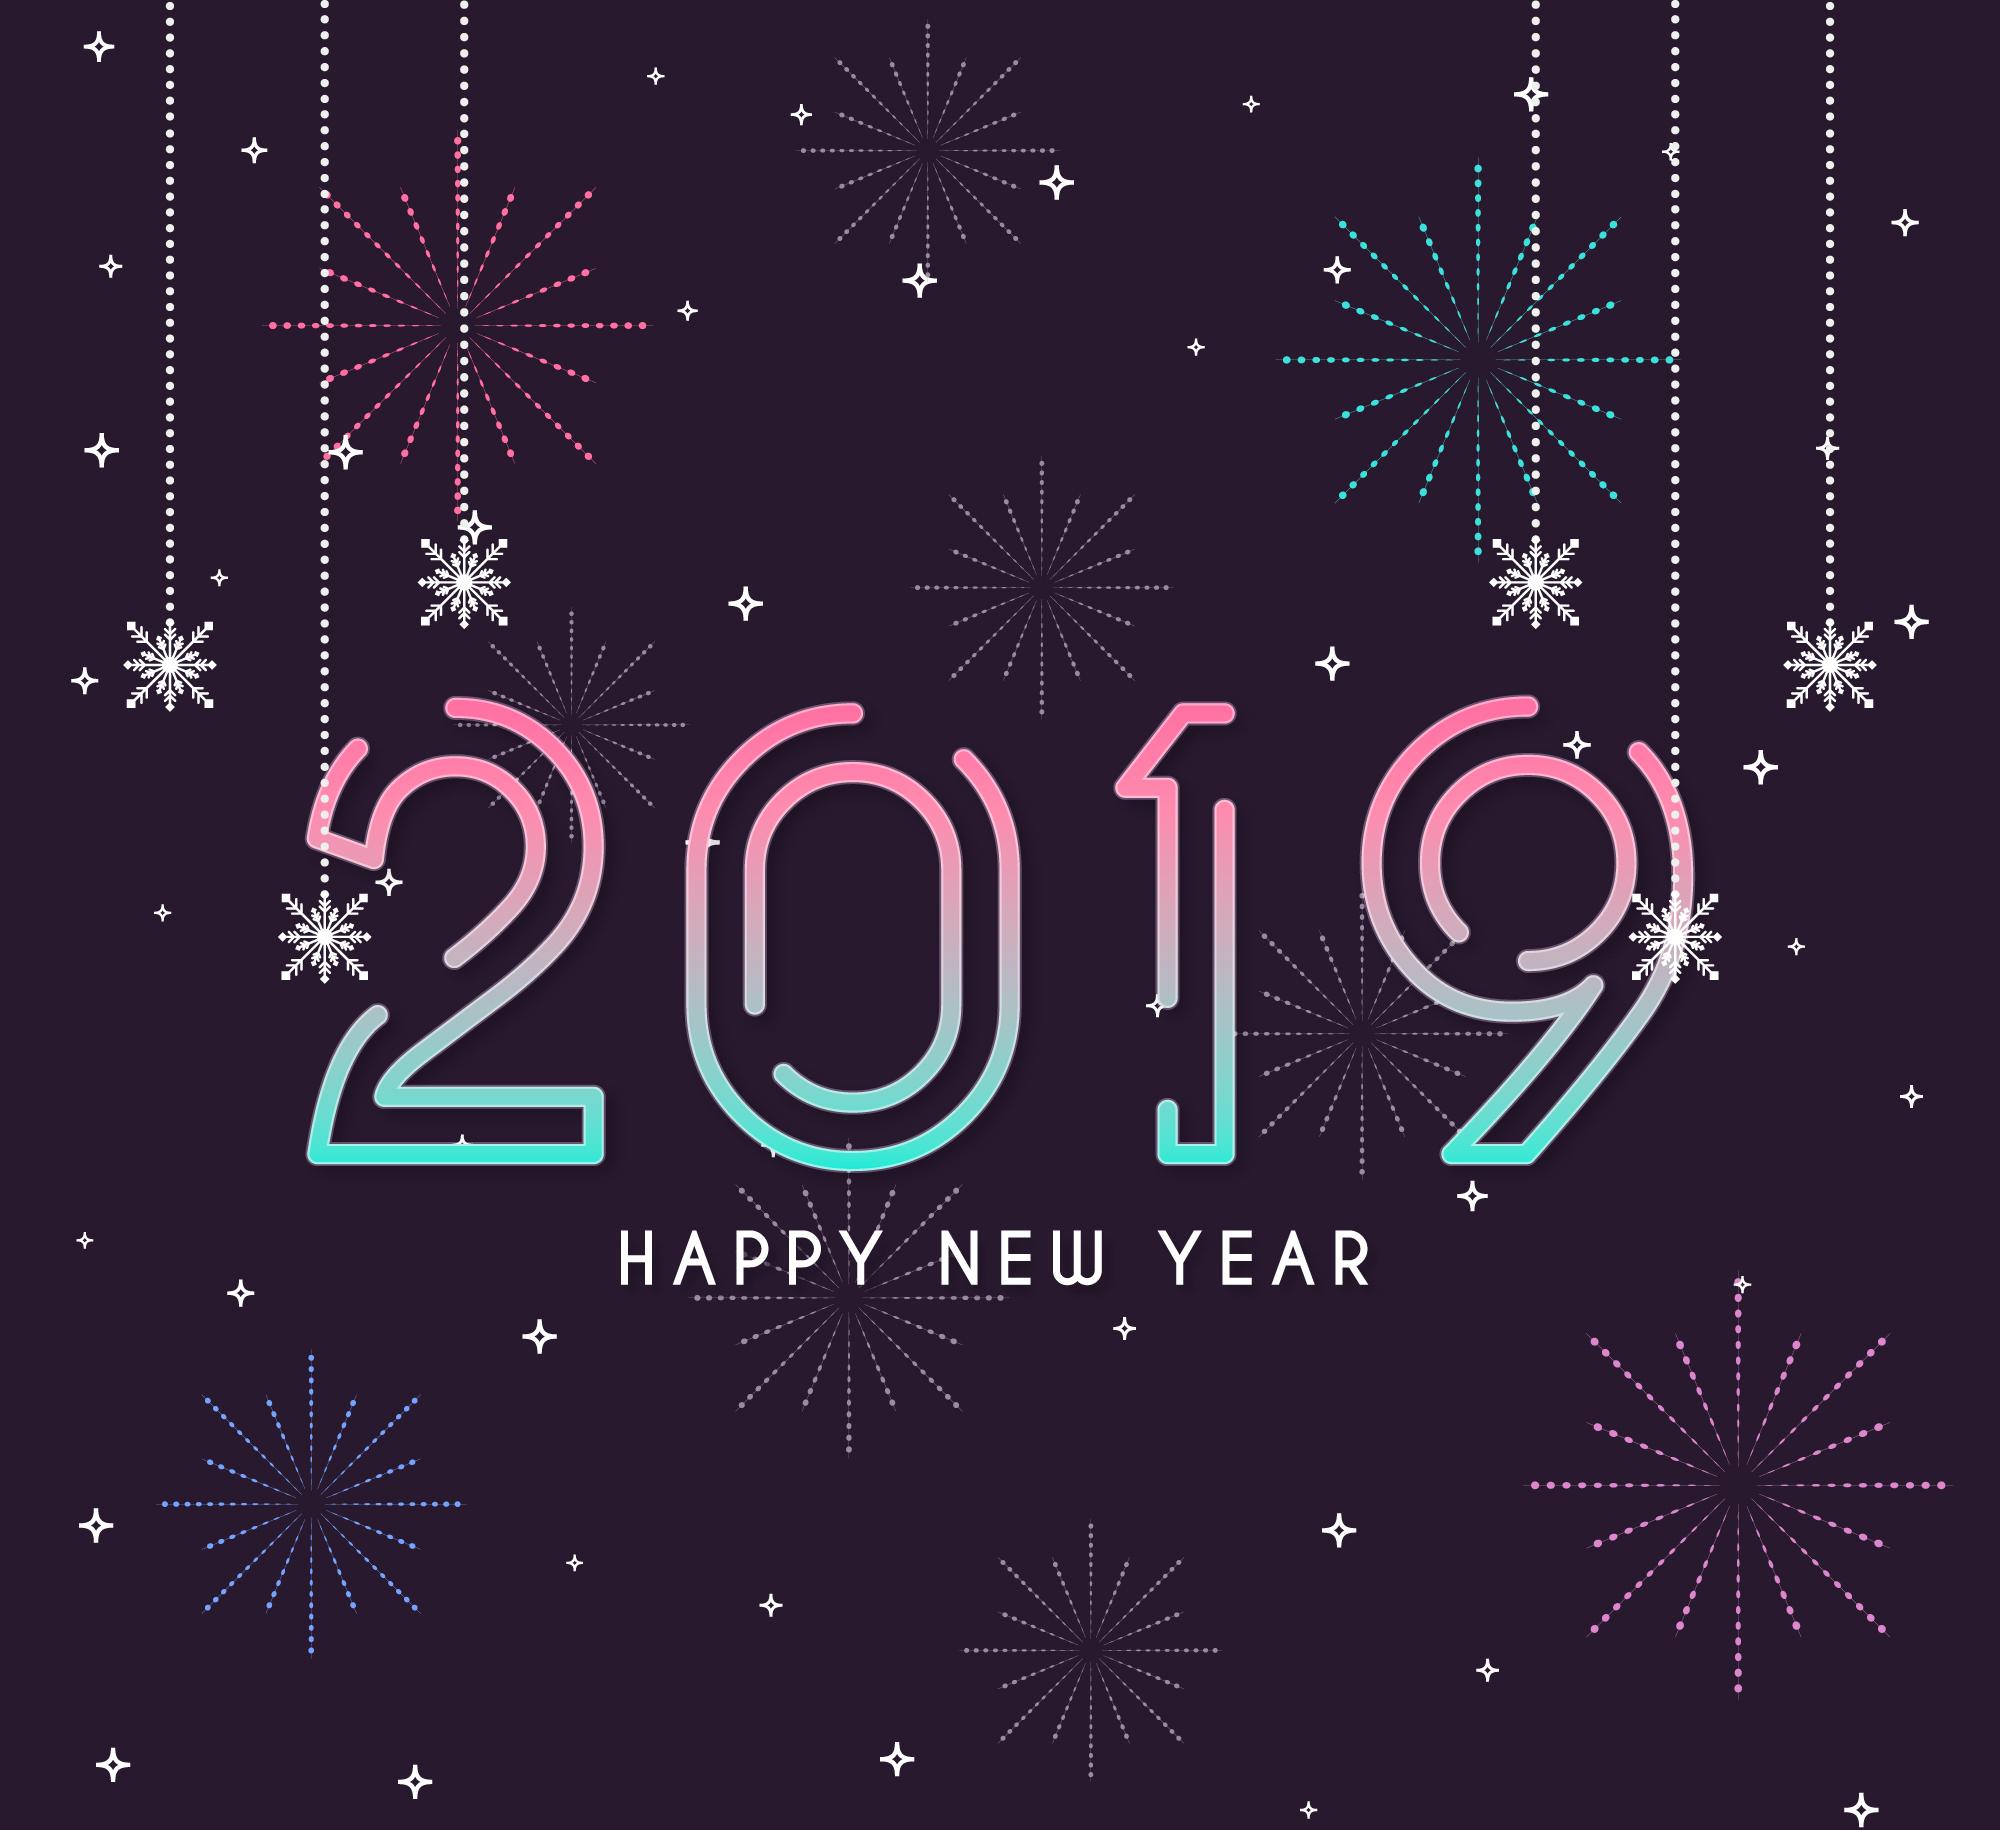 新年快乐创意2019时尚字体矢量素材 Happy New Year 2019 Stylish Text Design插图(1)